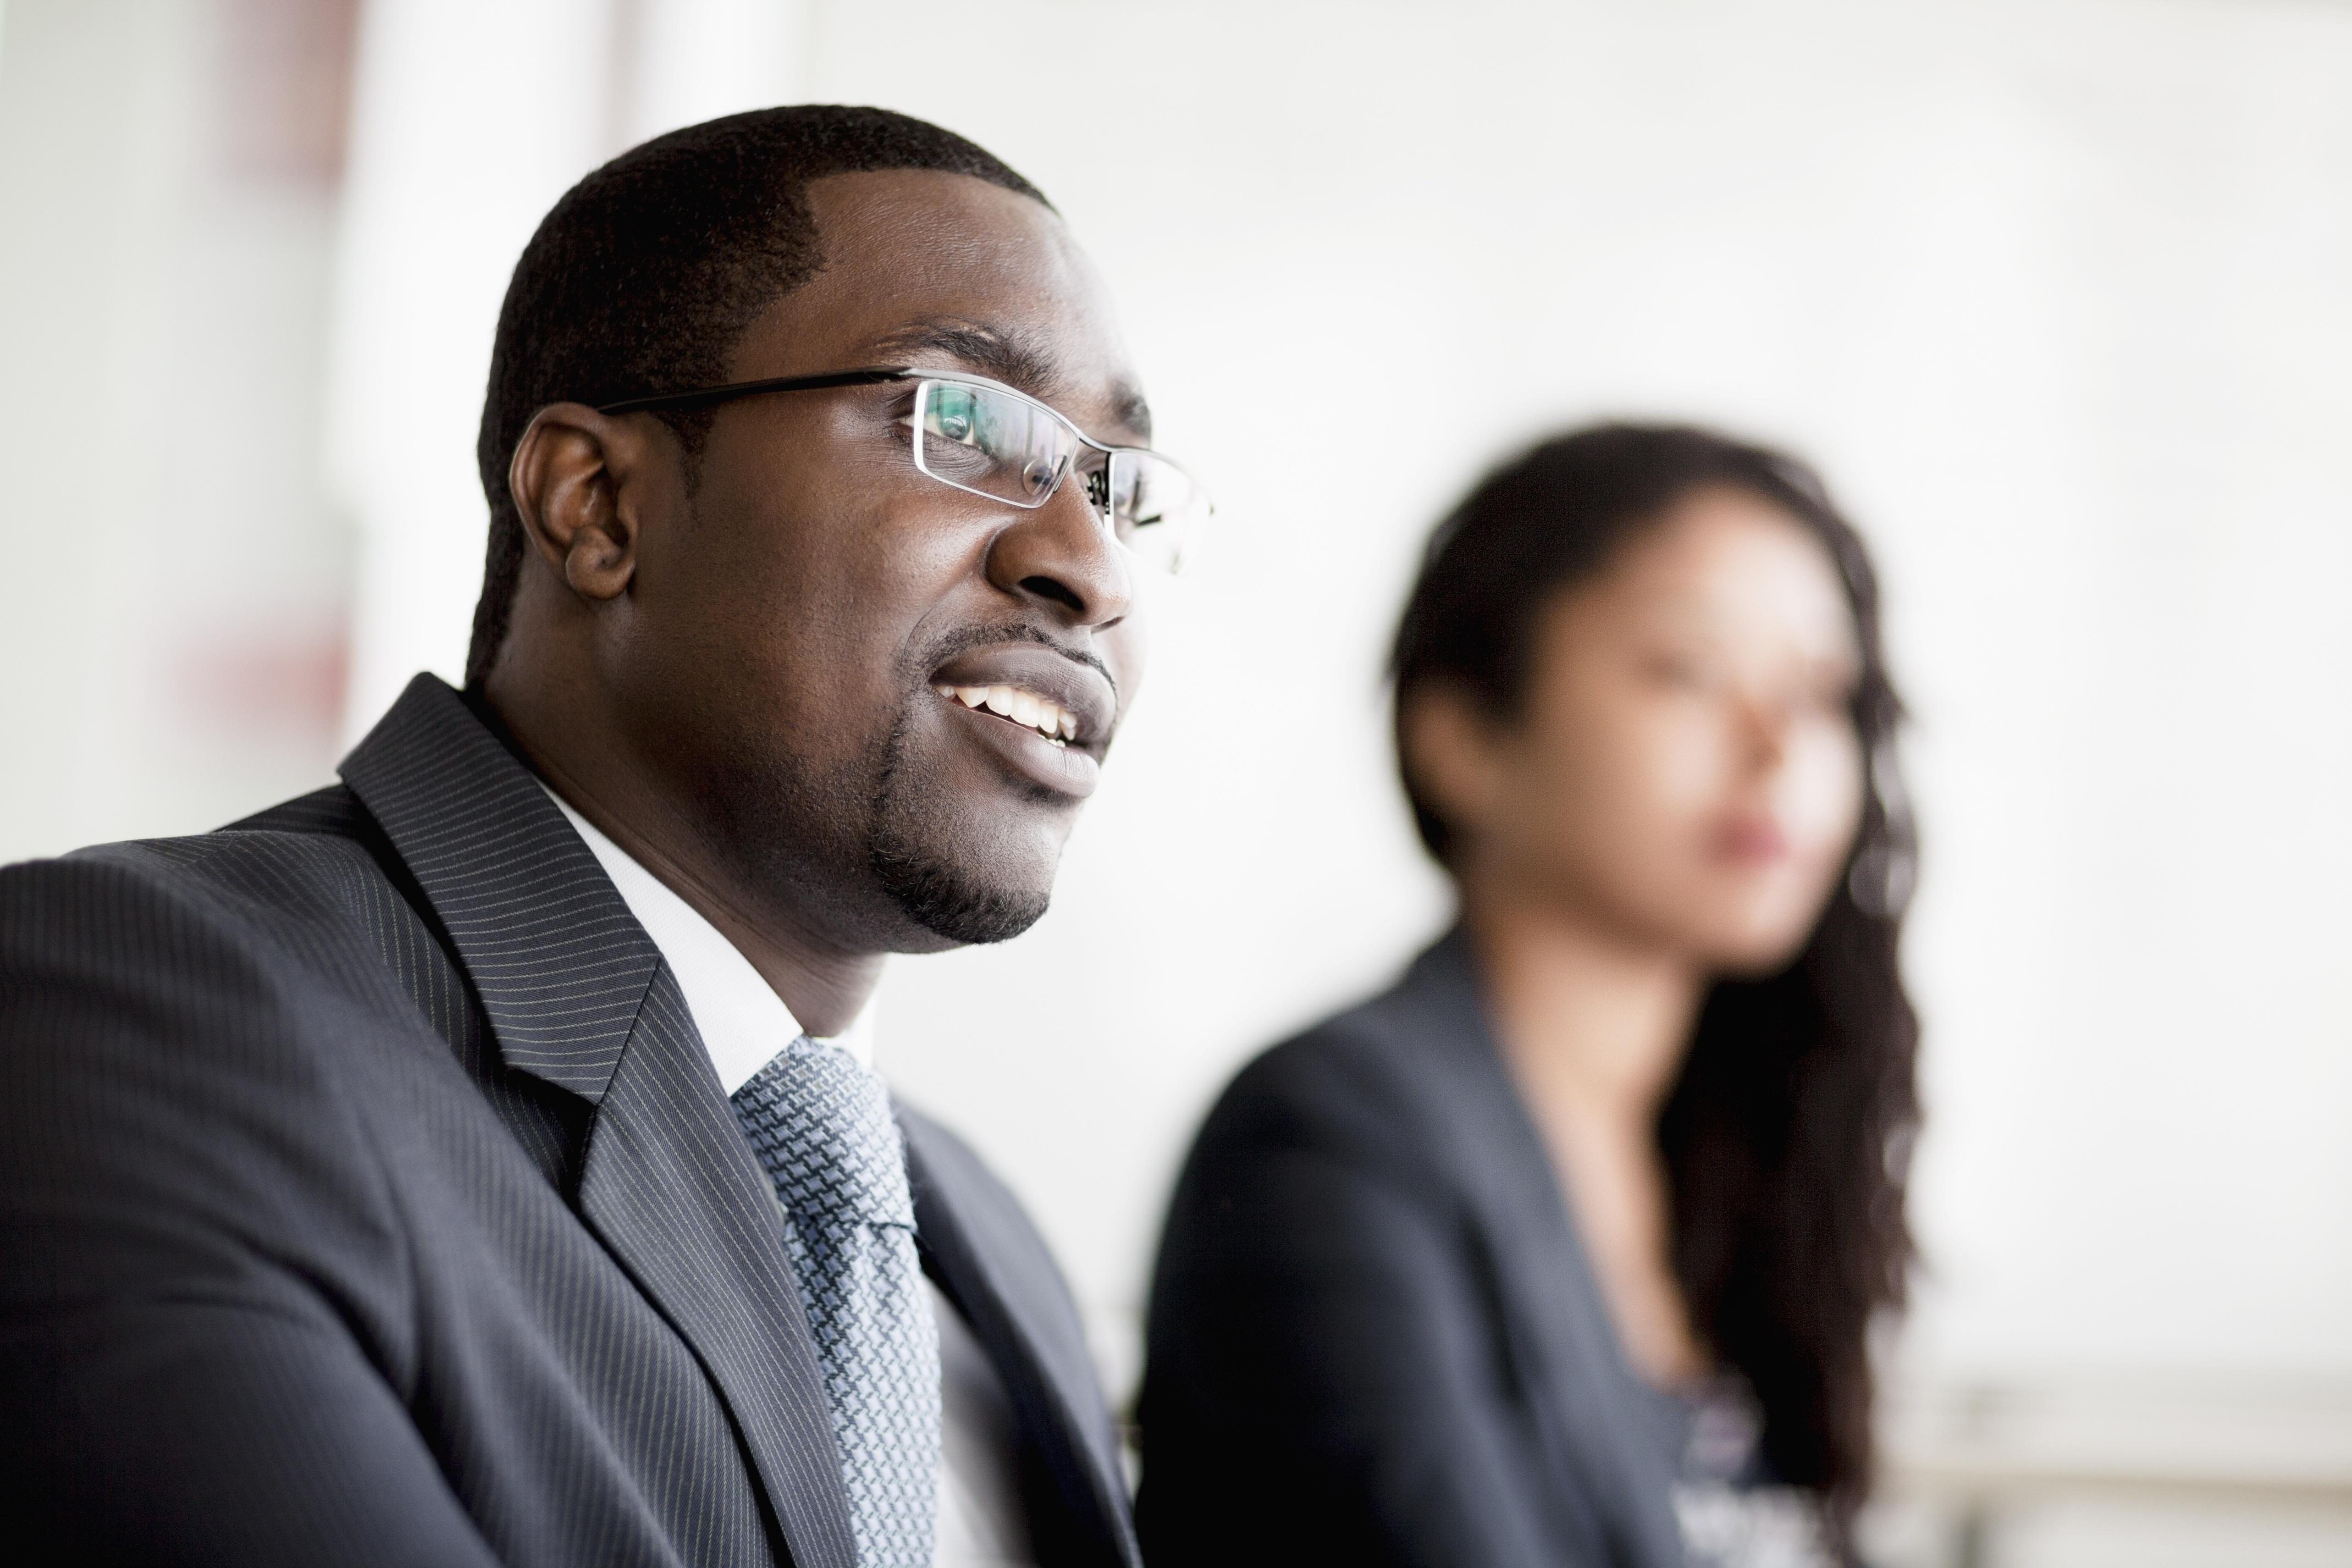 smiling-businessman-listening-at-a-business-PJW9URS.jpg